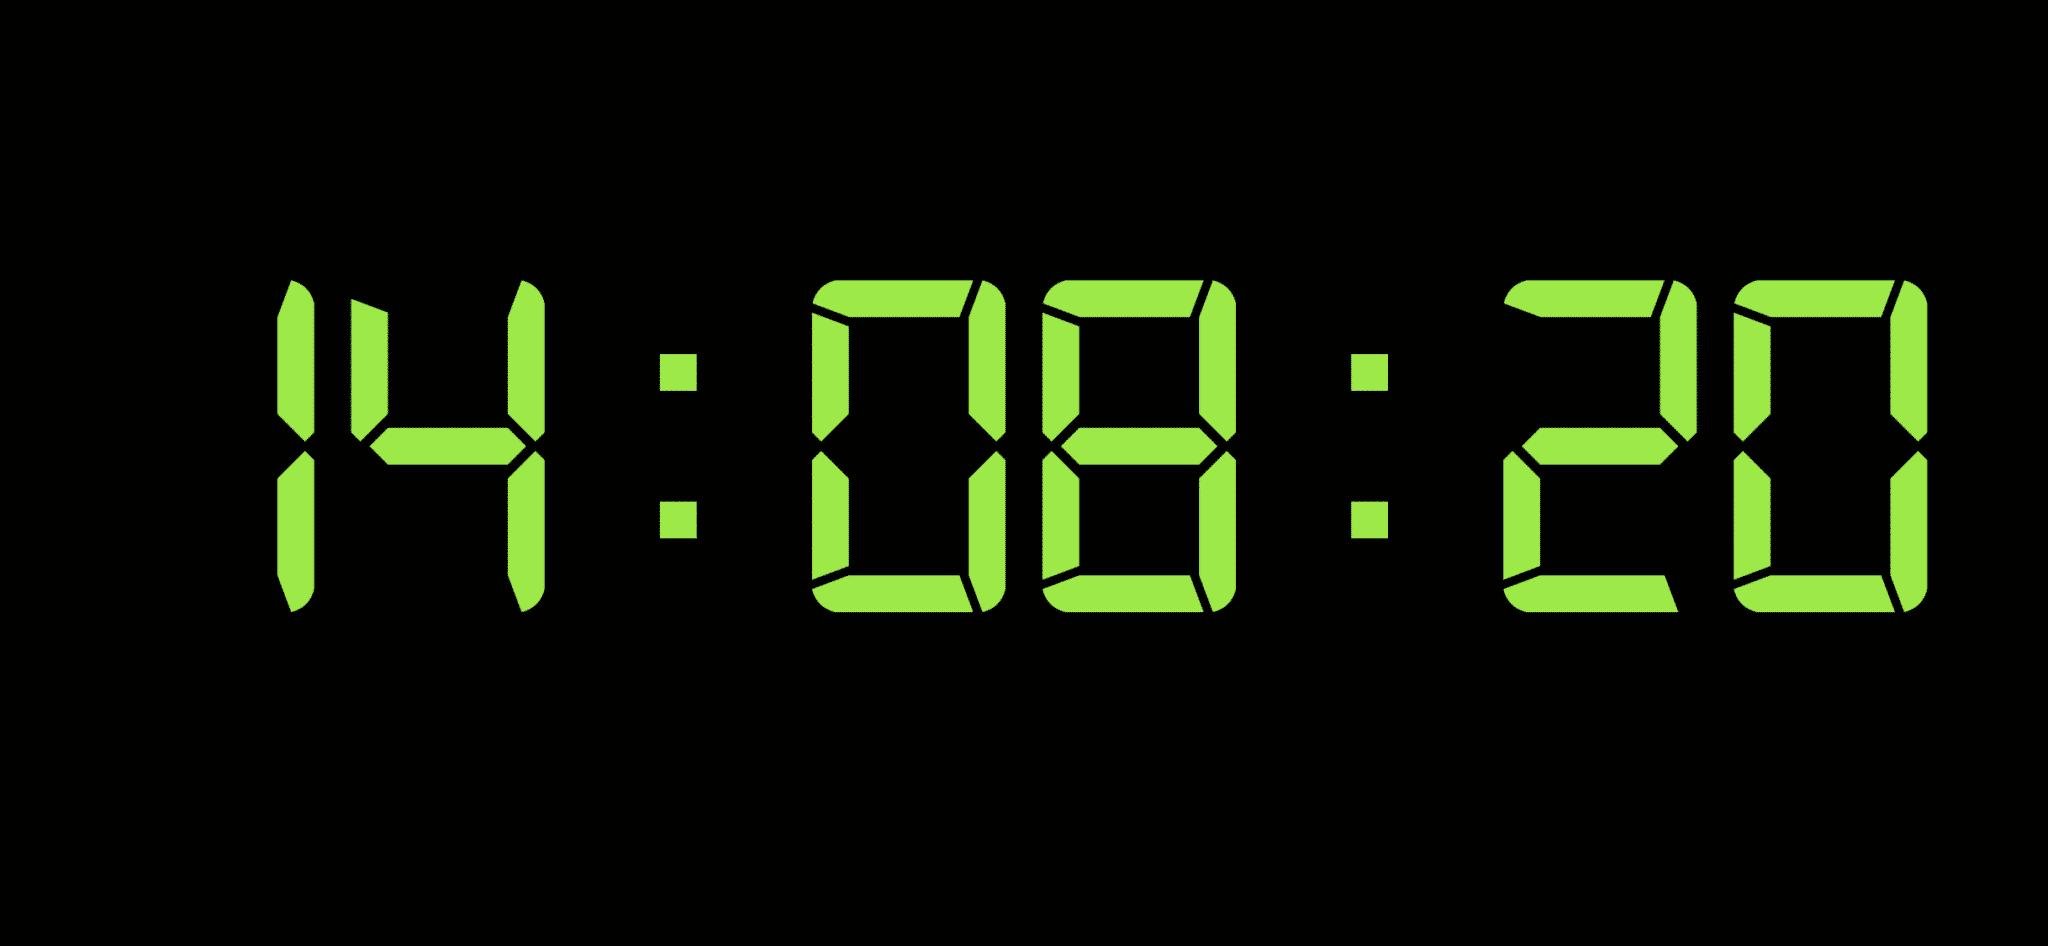 Ampron Digital Wall Clock